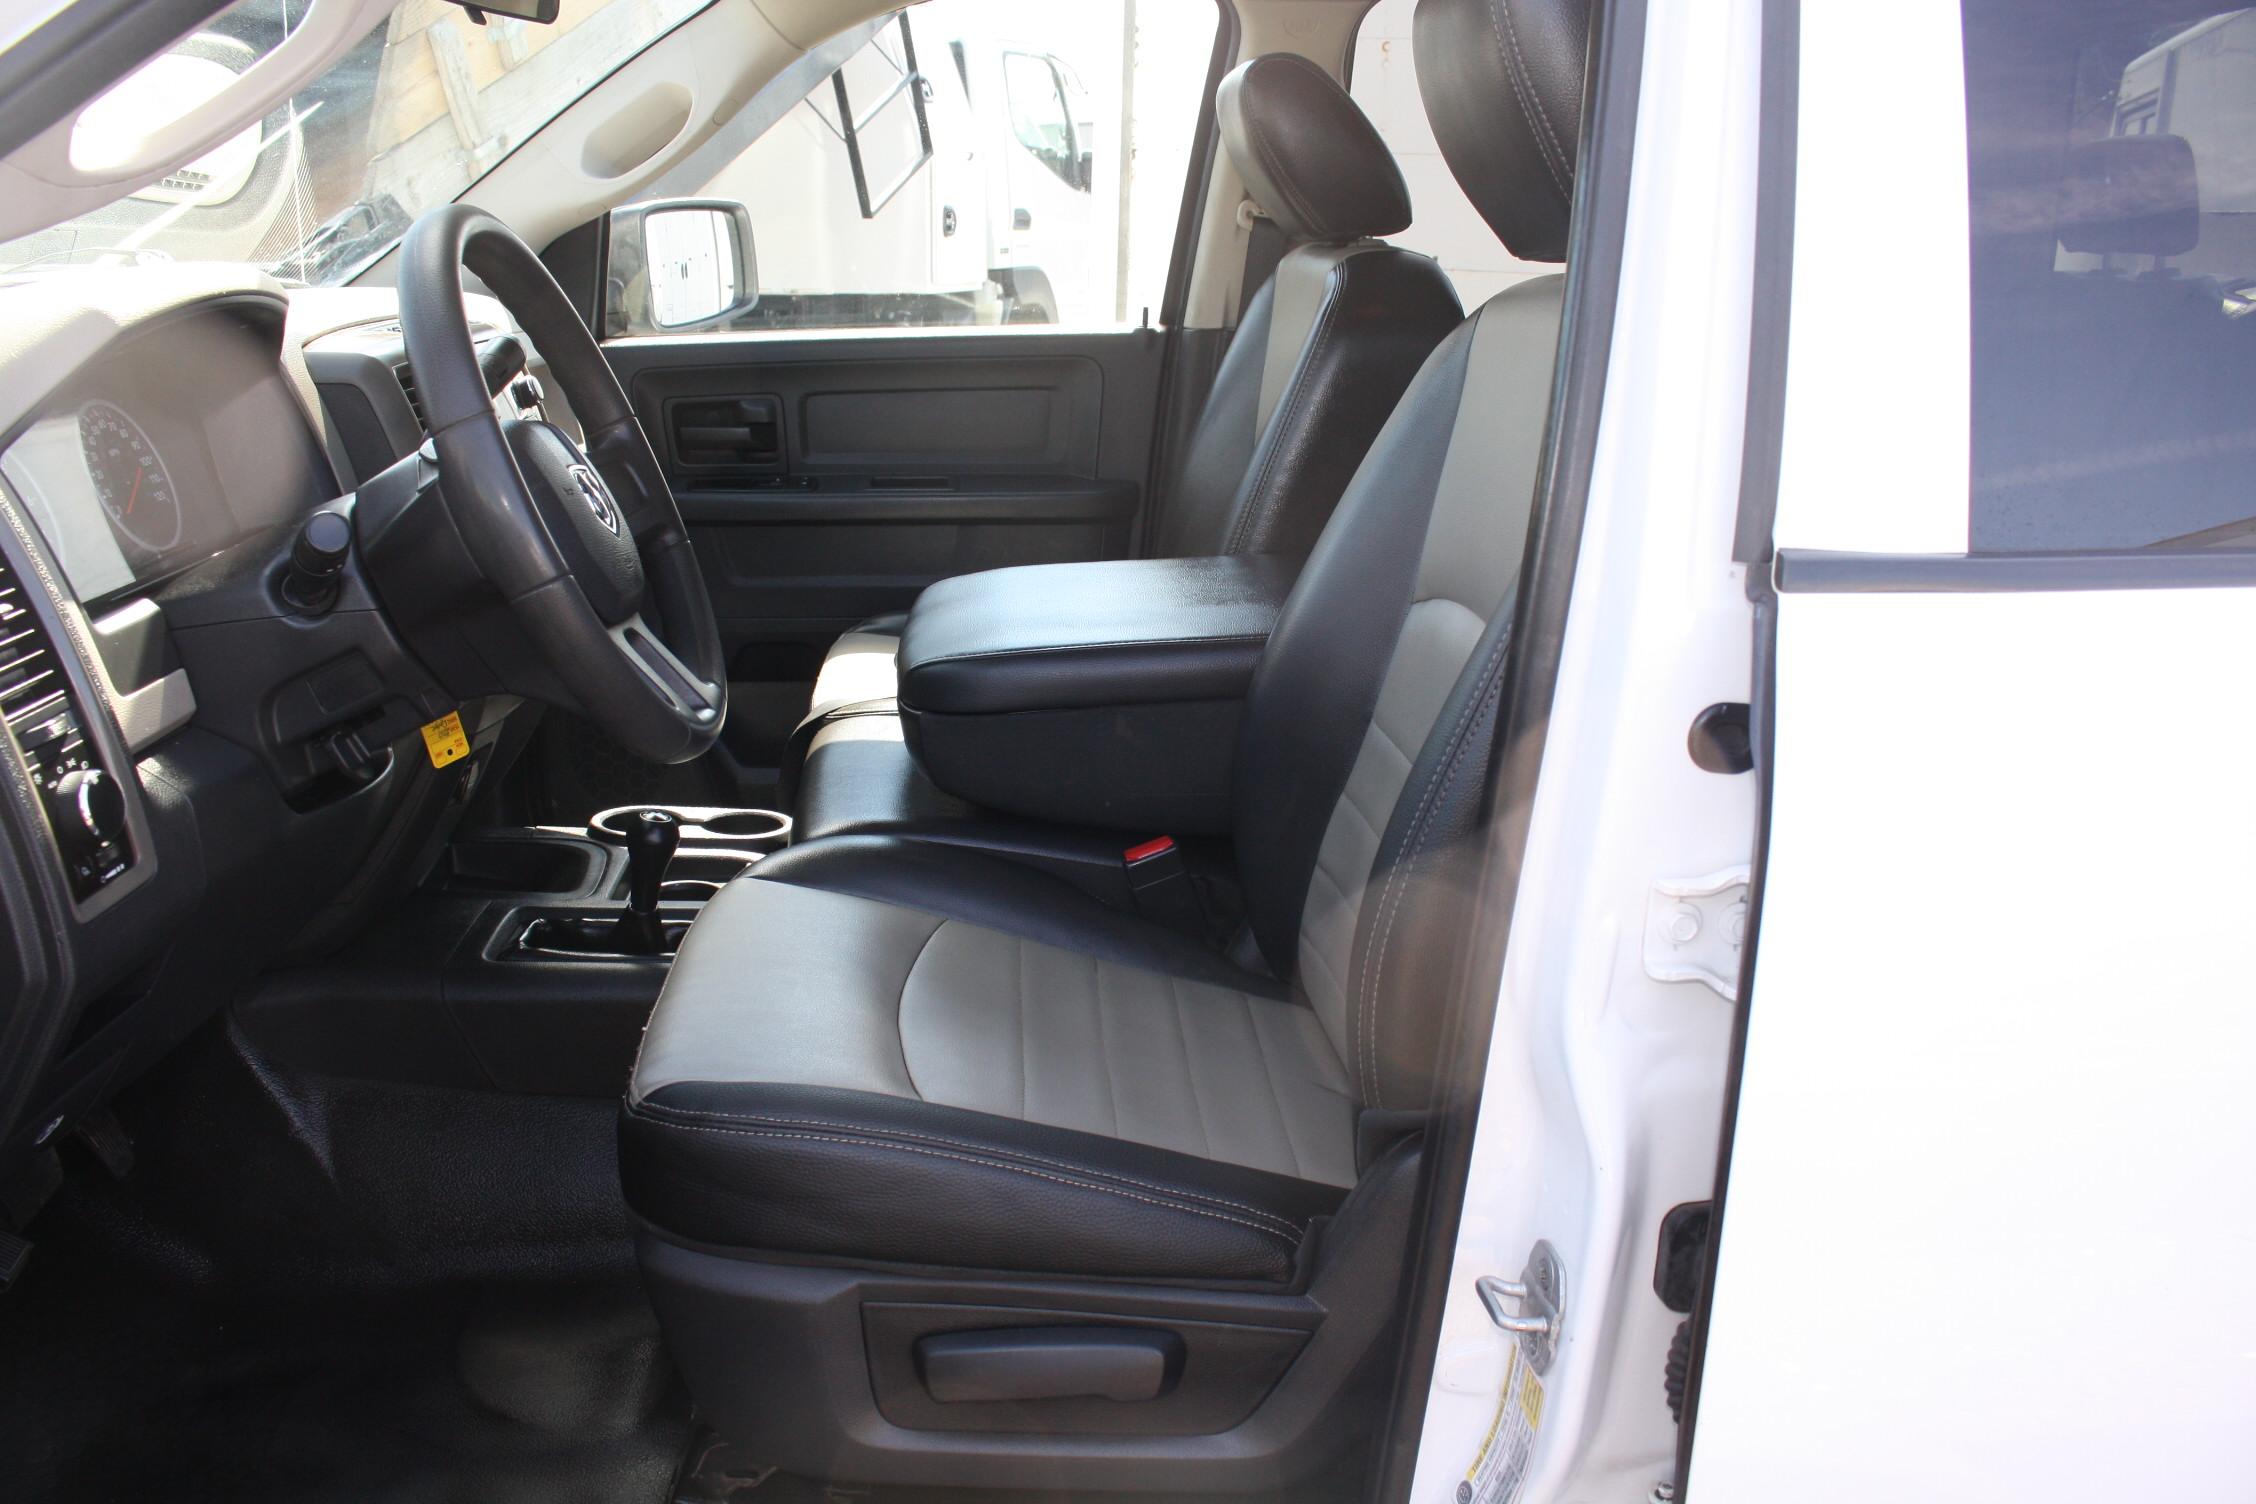 IMG 2998 - 2010 DODGE RAM 2500HD KNAPHEIDE UTILITY TRUCK